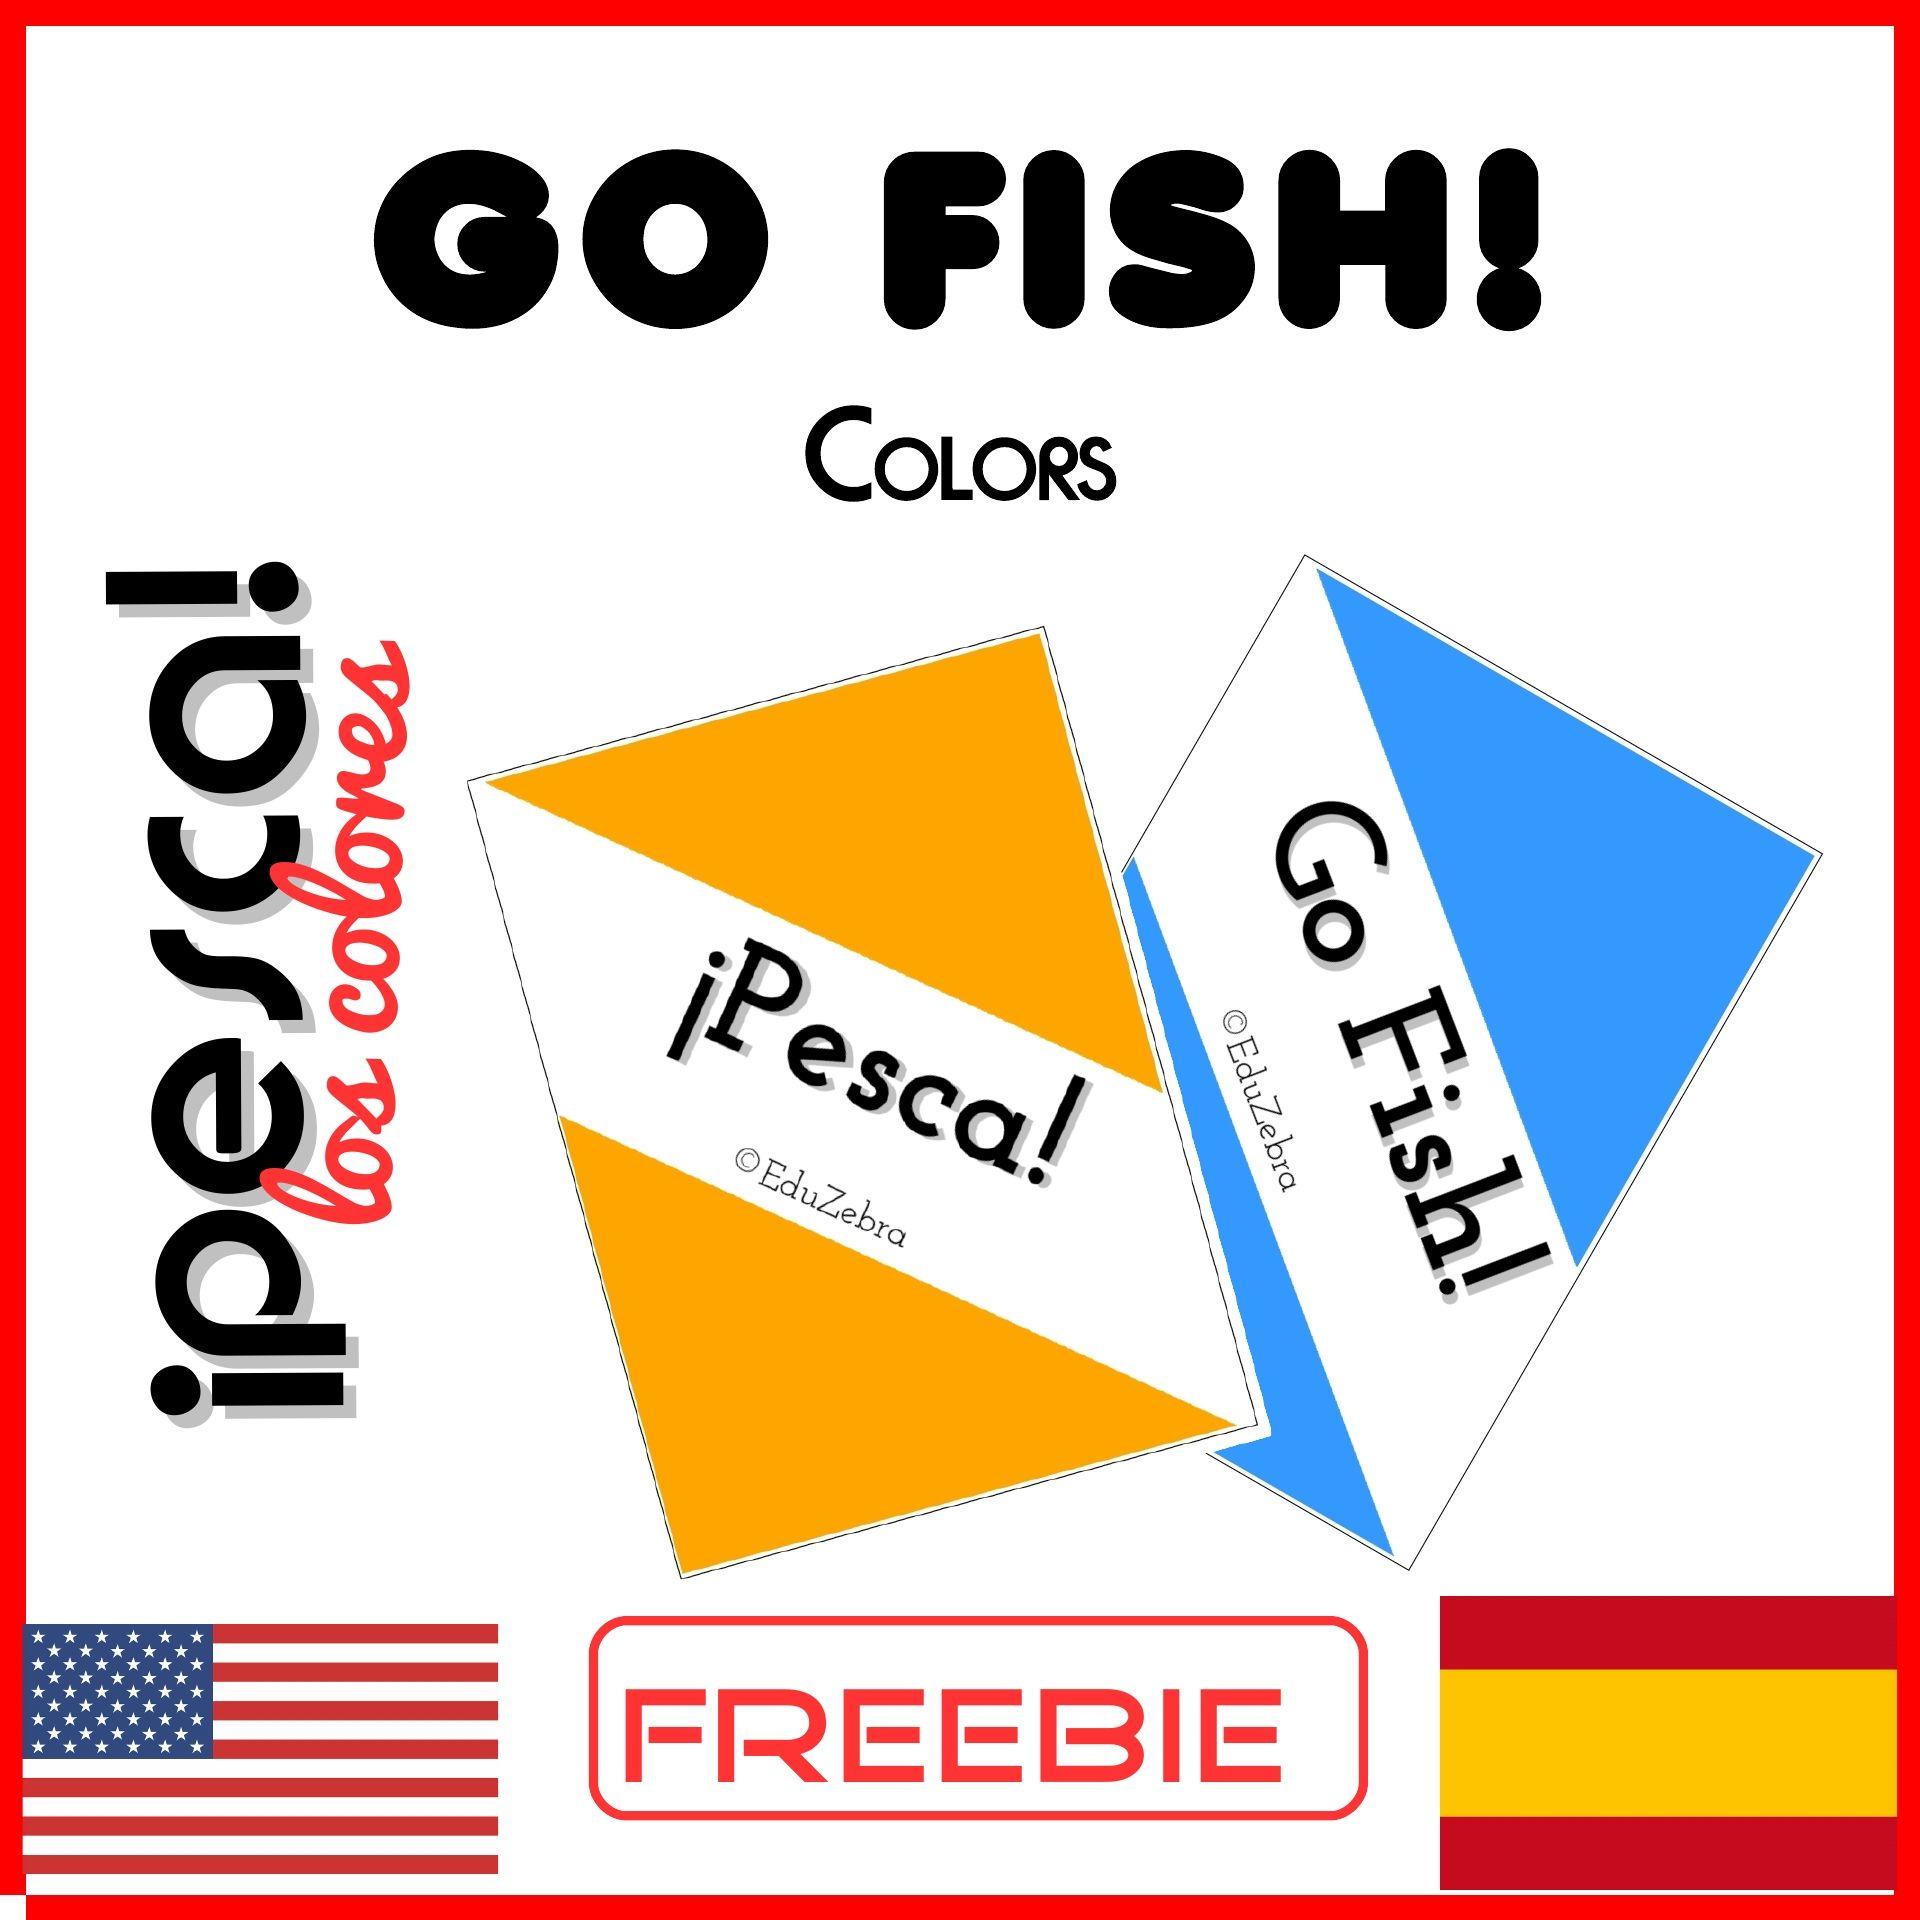 Go Fish Colors Pesca Los Colores Spanish Esl Going Fishing Spanish Fish [ 1920 x 1920 Pixel ]